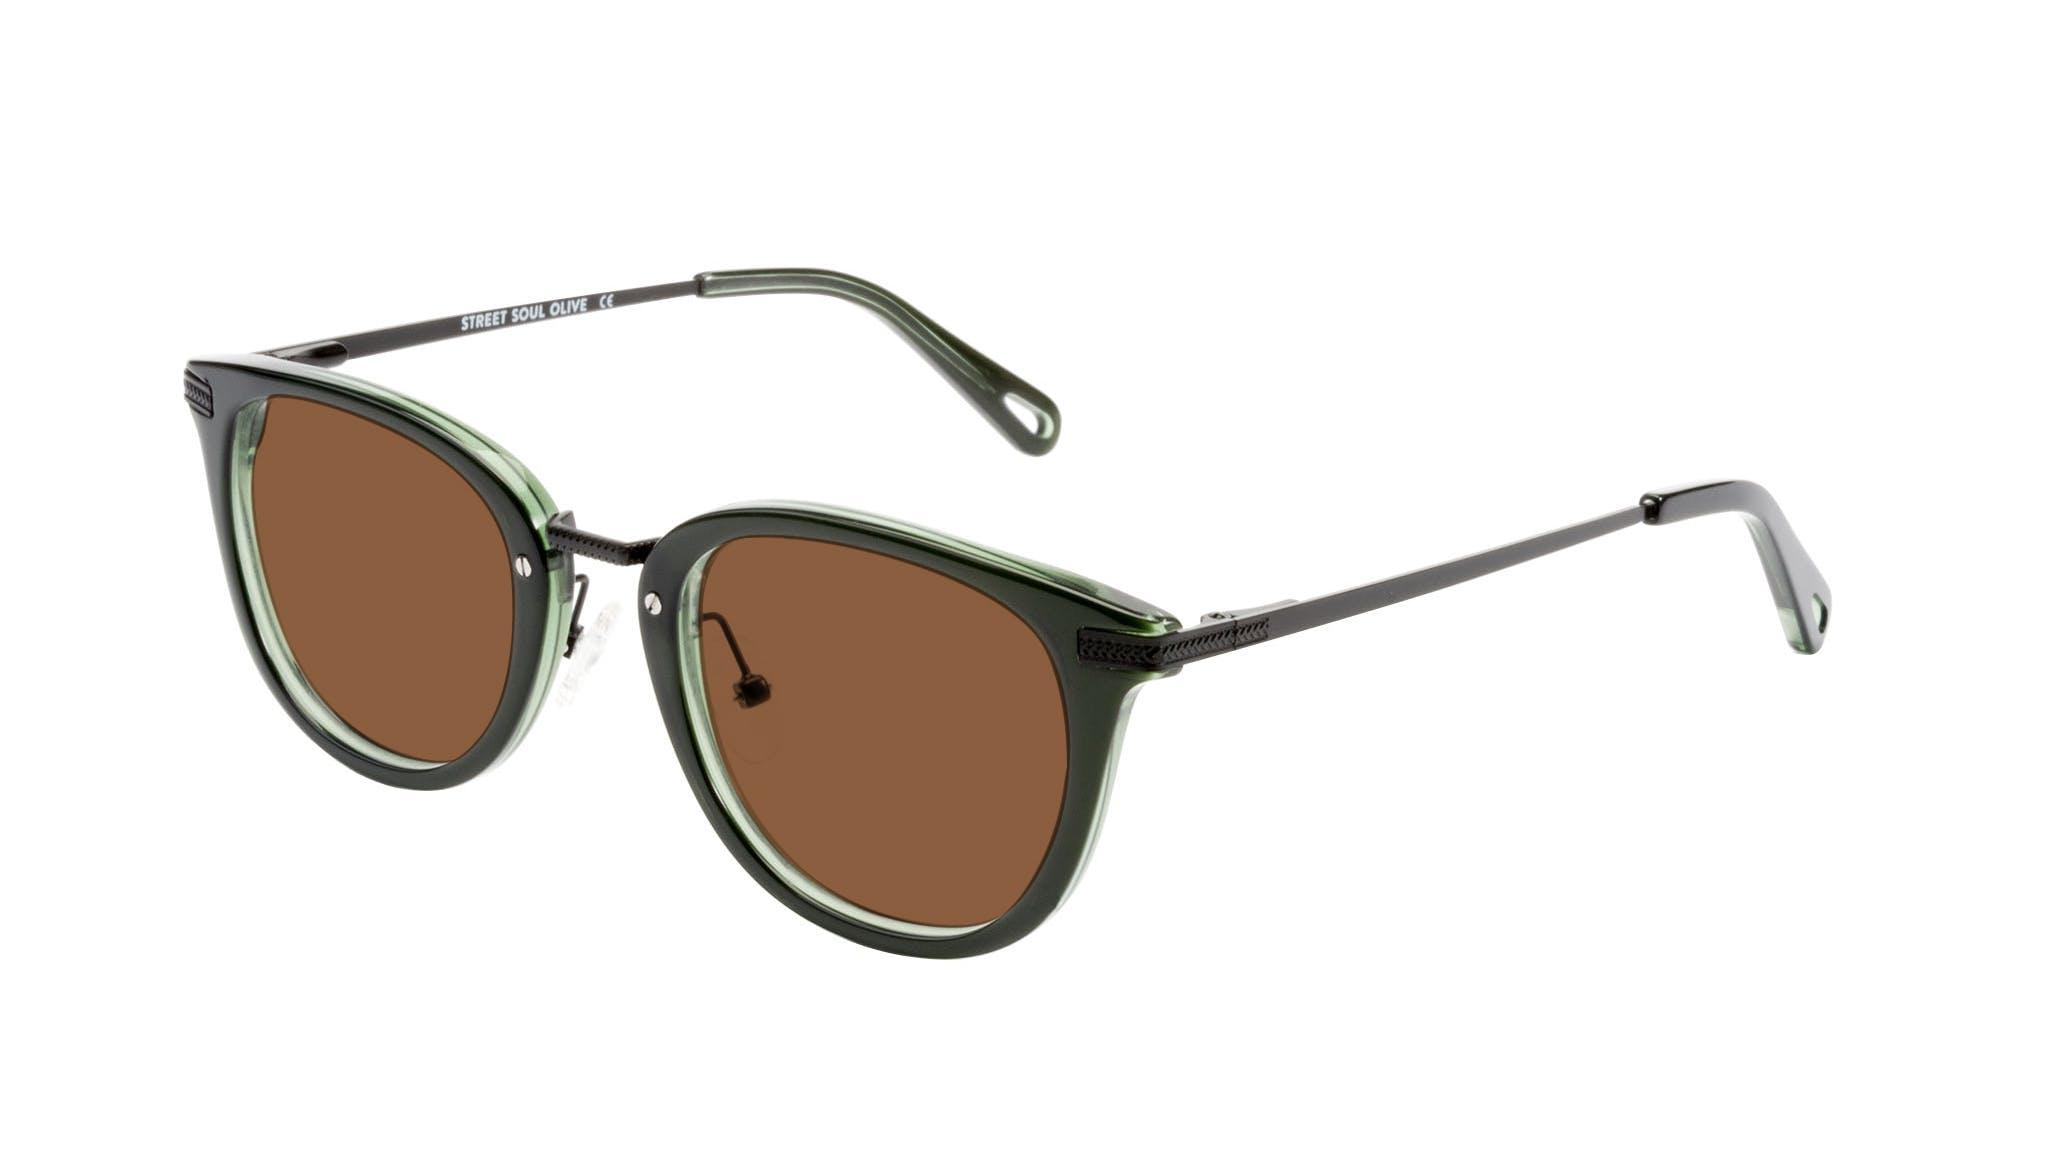 Affordable Fashion Glasses Rectangle Square Sunglasses Men Street Soul Olive Tilt